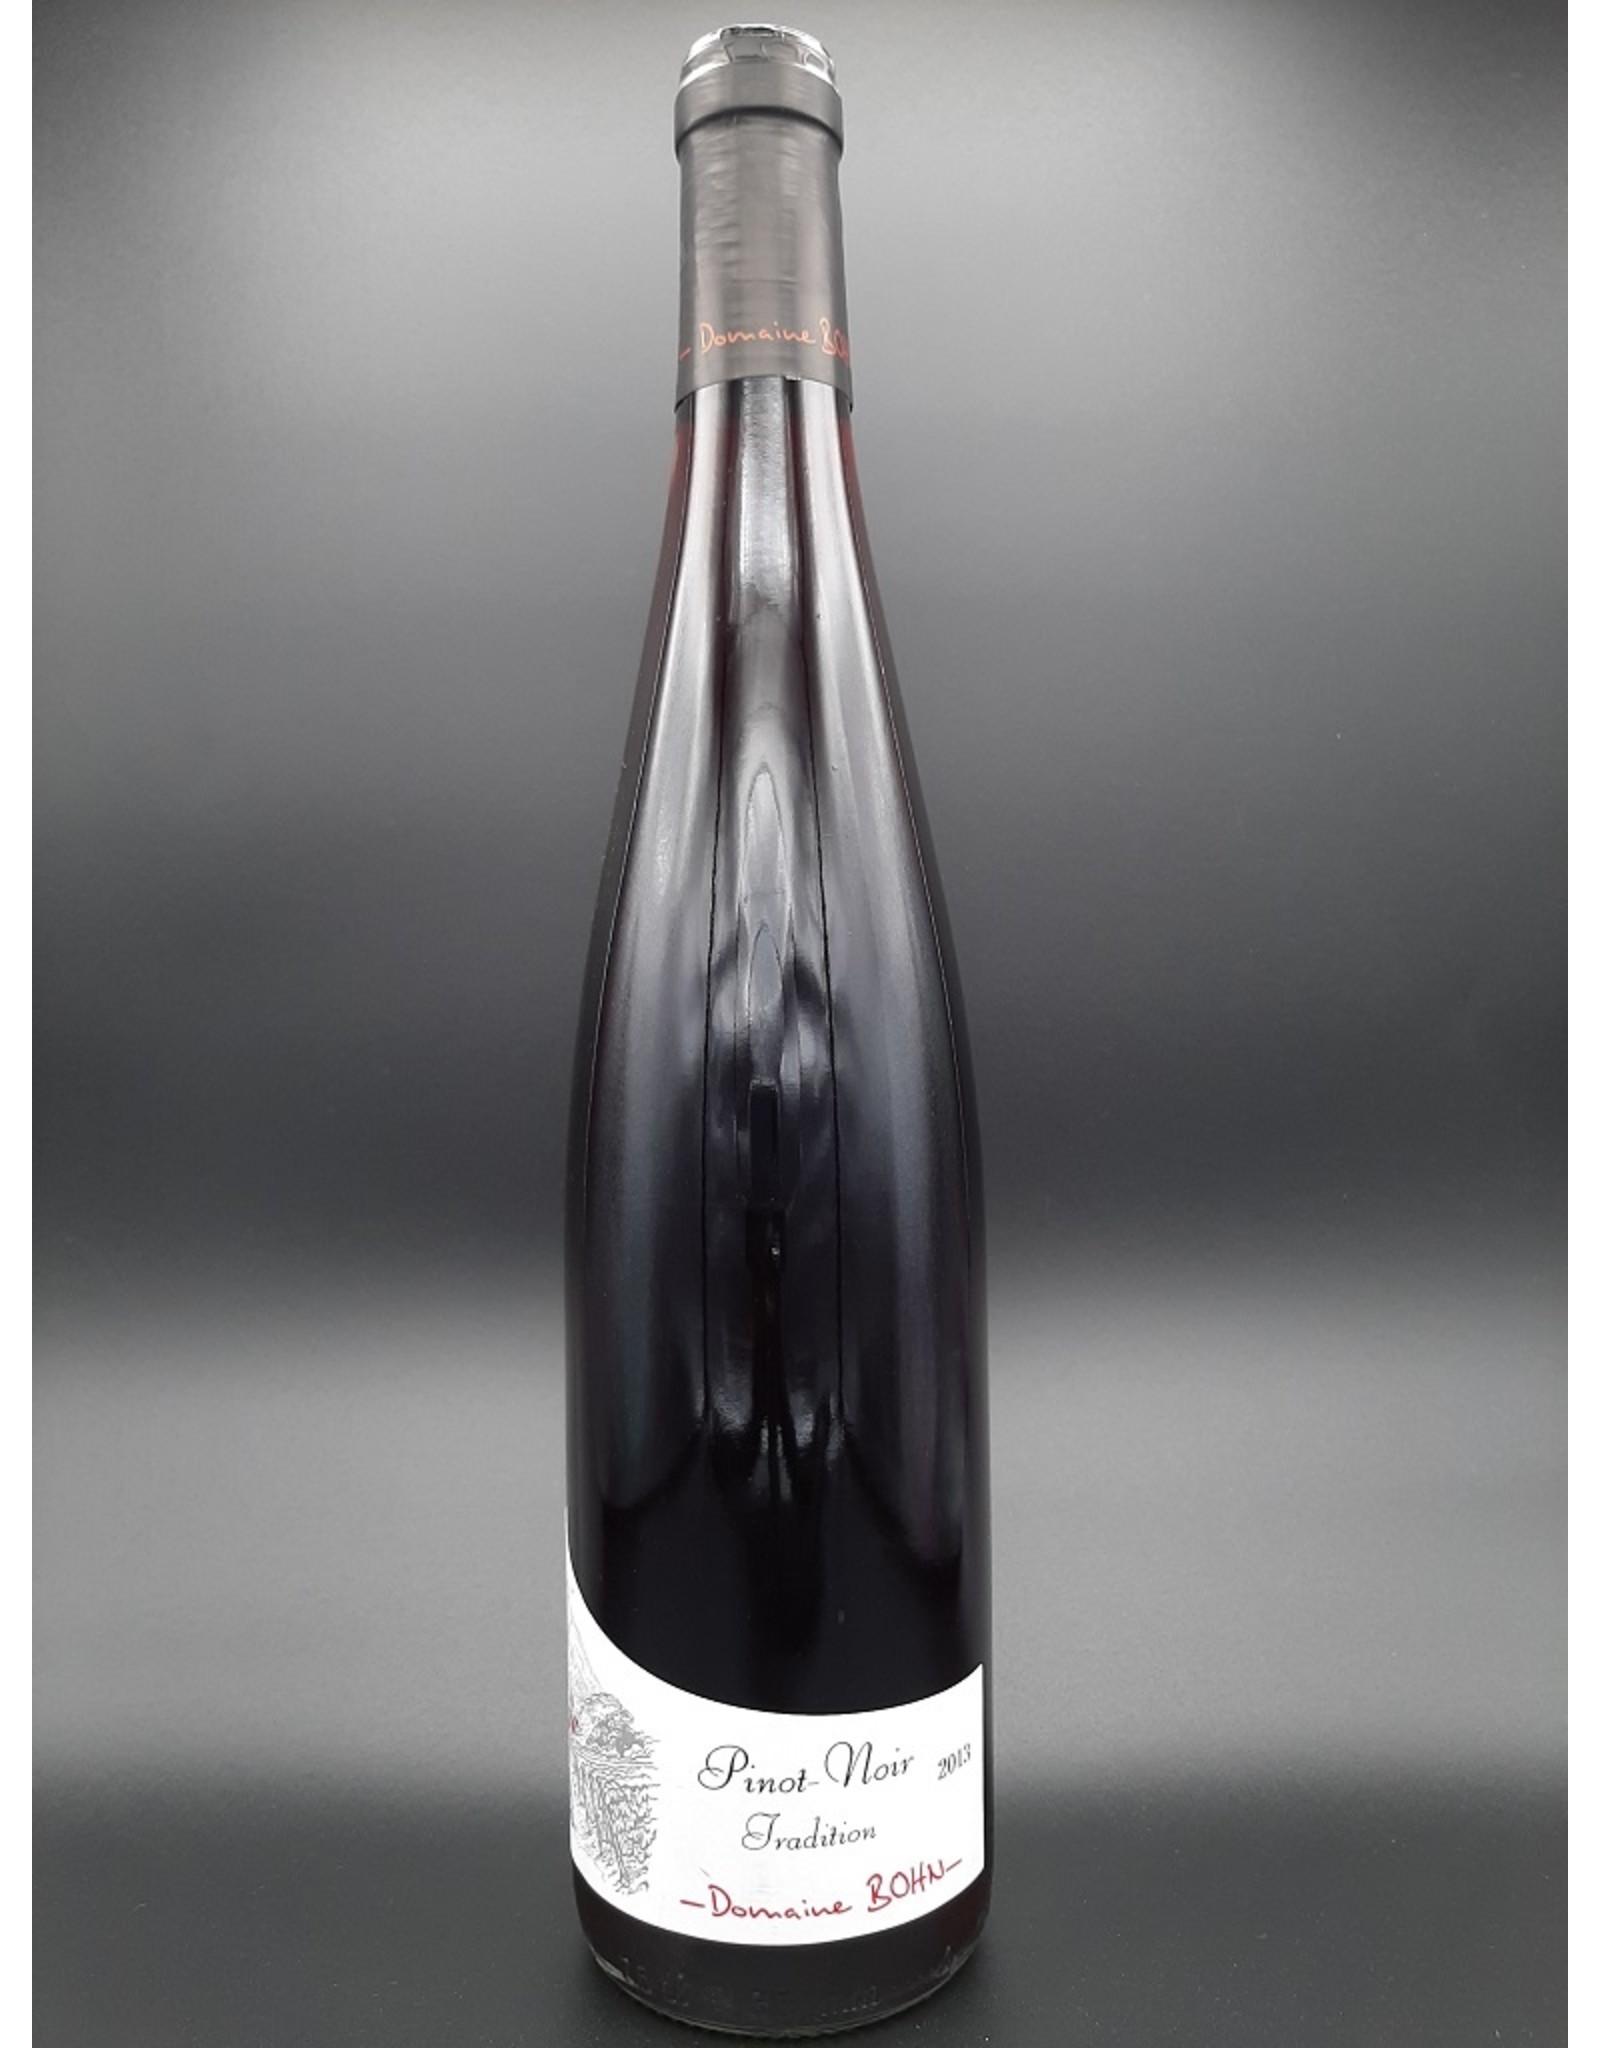 Domaine Bohn Pinot Noir Tradition 2013